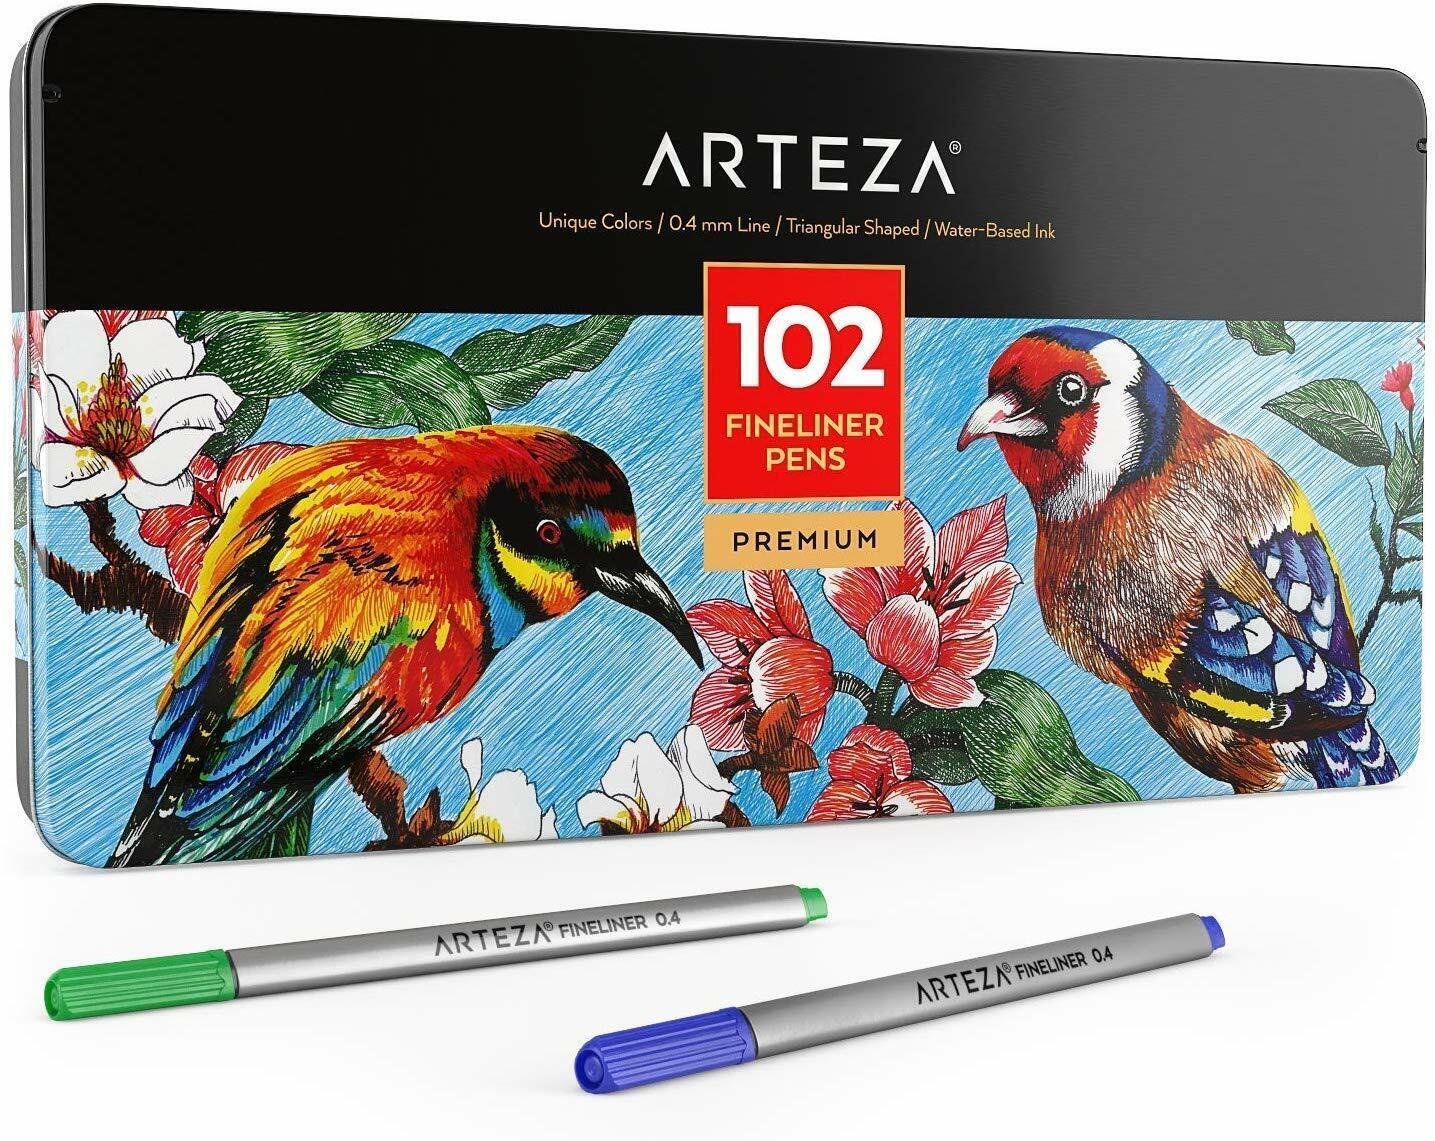 Fine Tip Markers 48 Assorted Colors Arteza Fineliner Fine Point Pens 0.4mm Tips, Set of 48